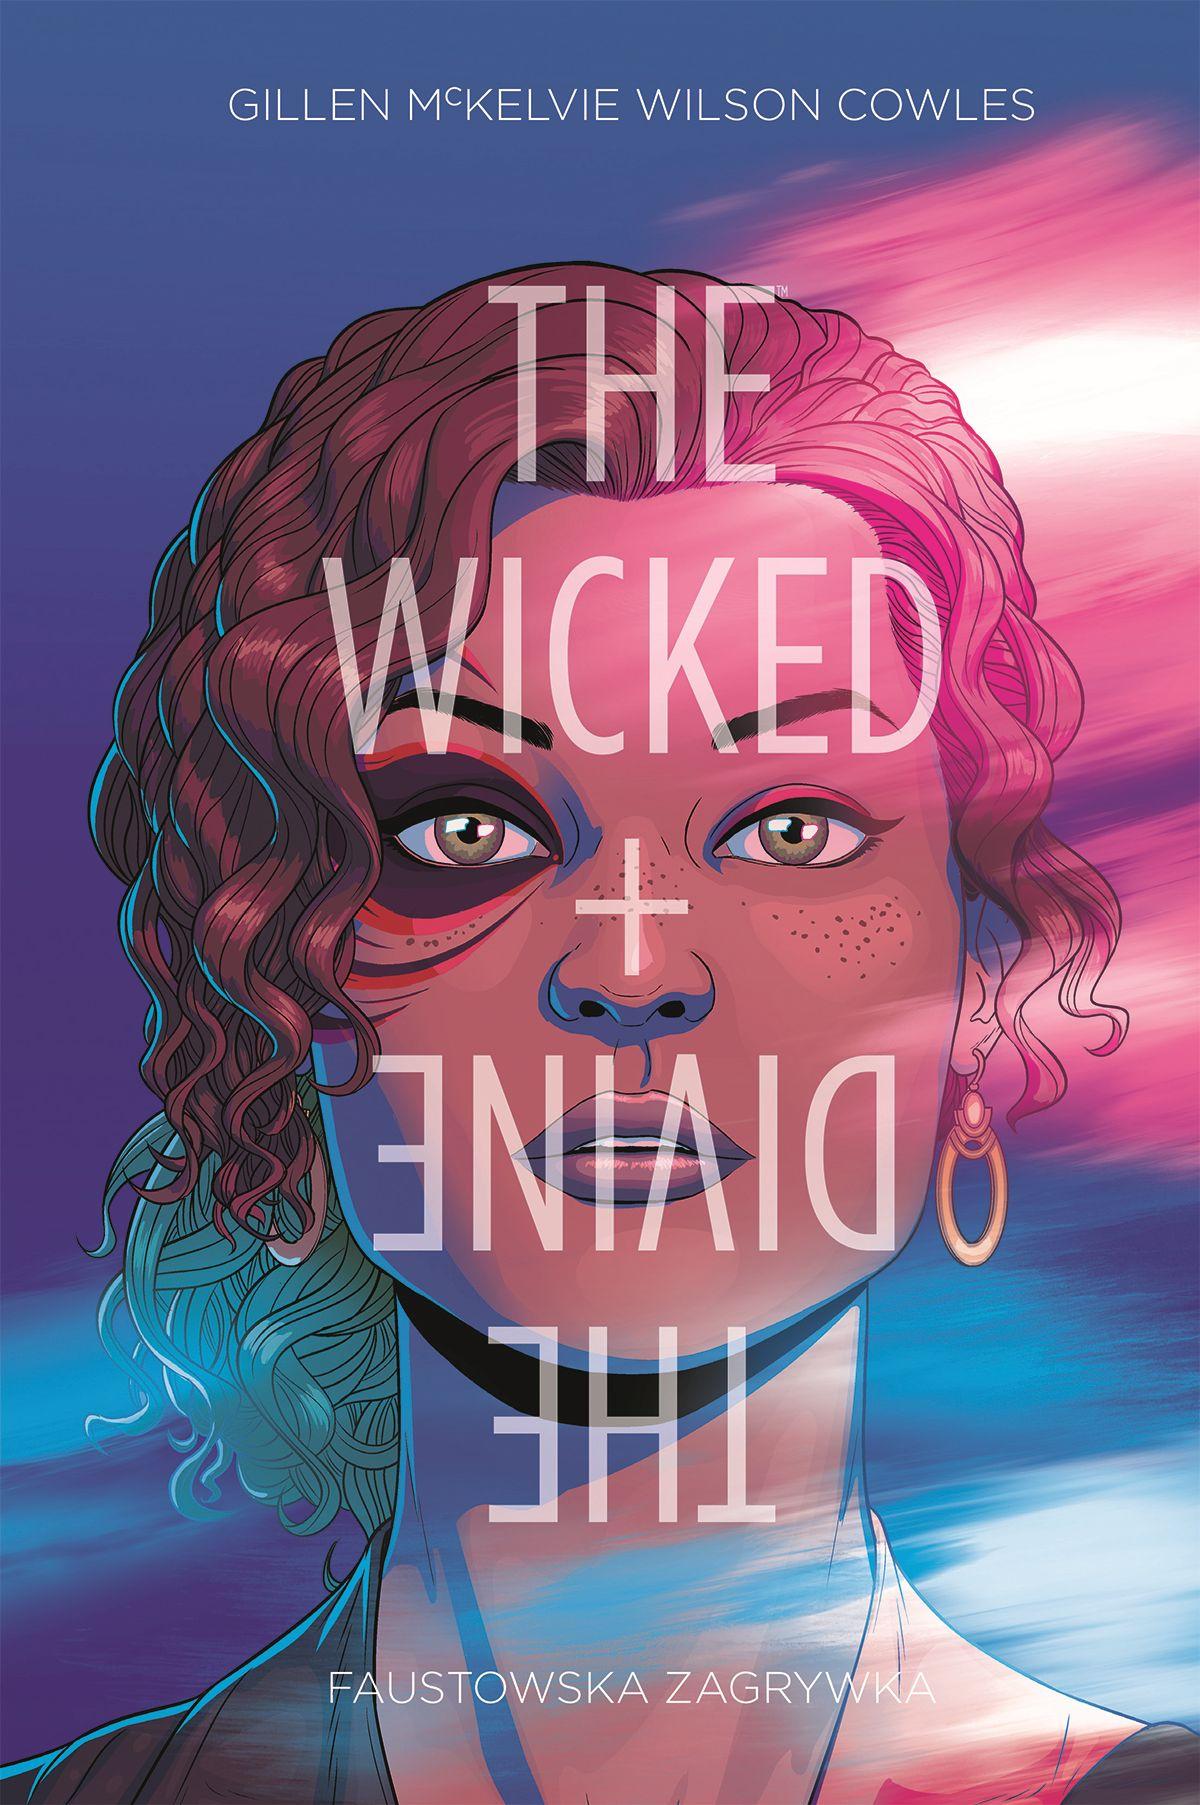 The Wicked The Divine tom 1 - okładka